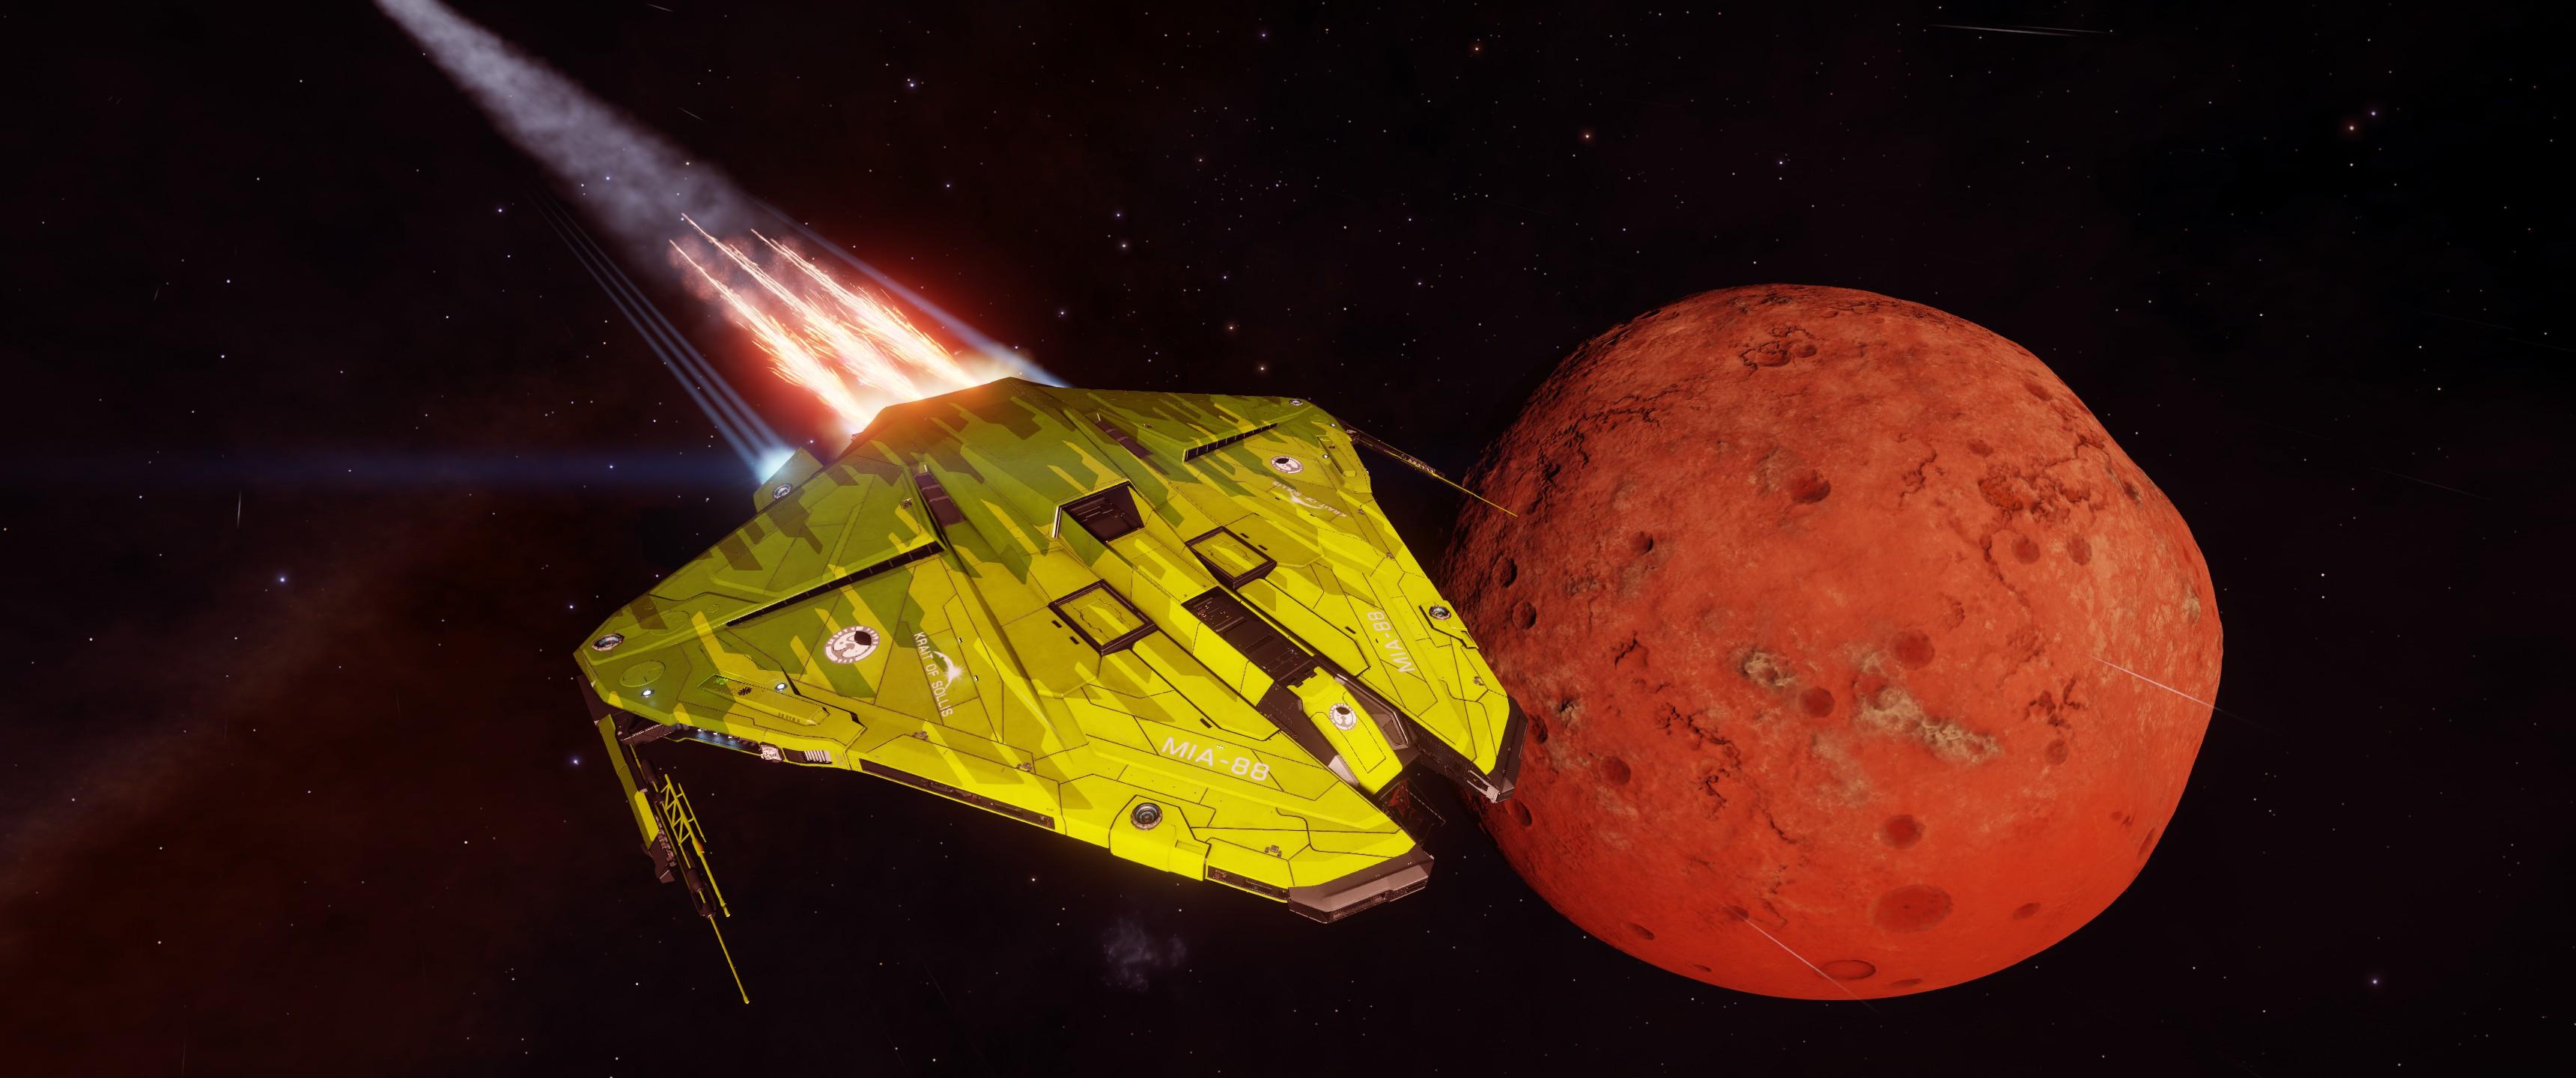 Elite Dangerous: Horizons |OT| Just scratching the surface